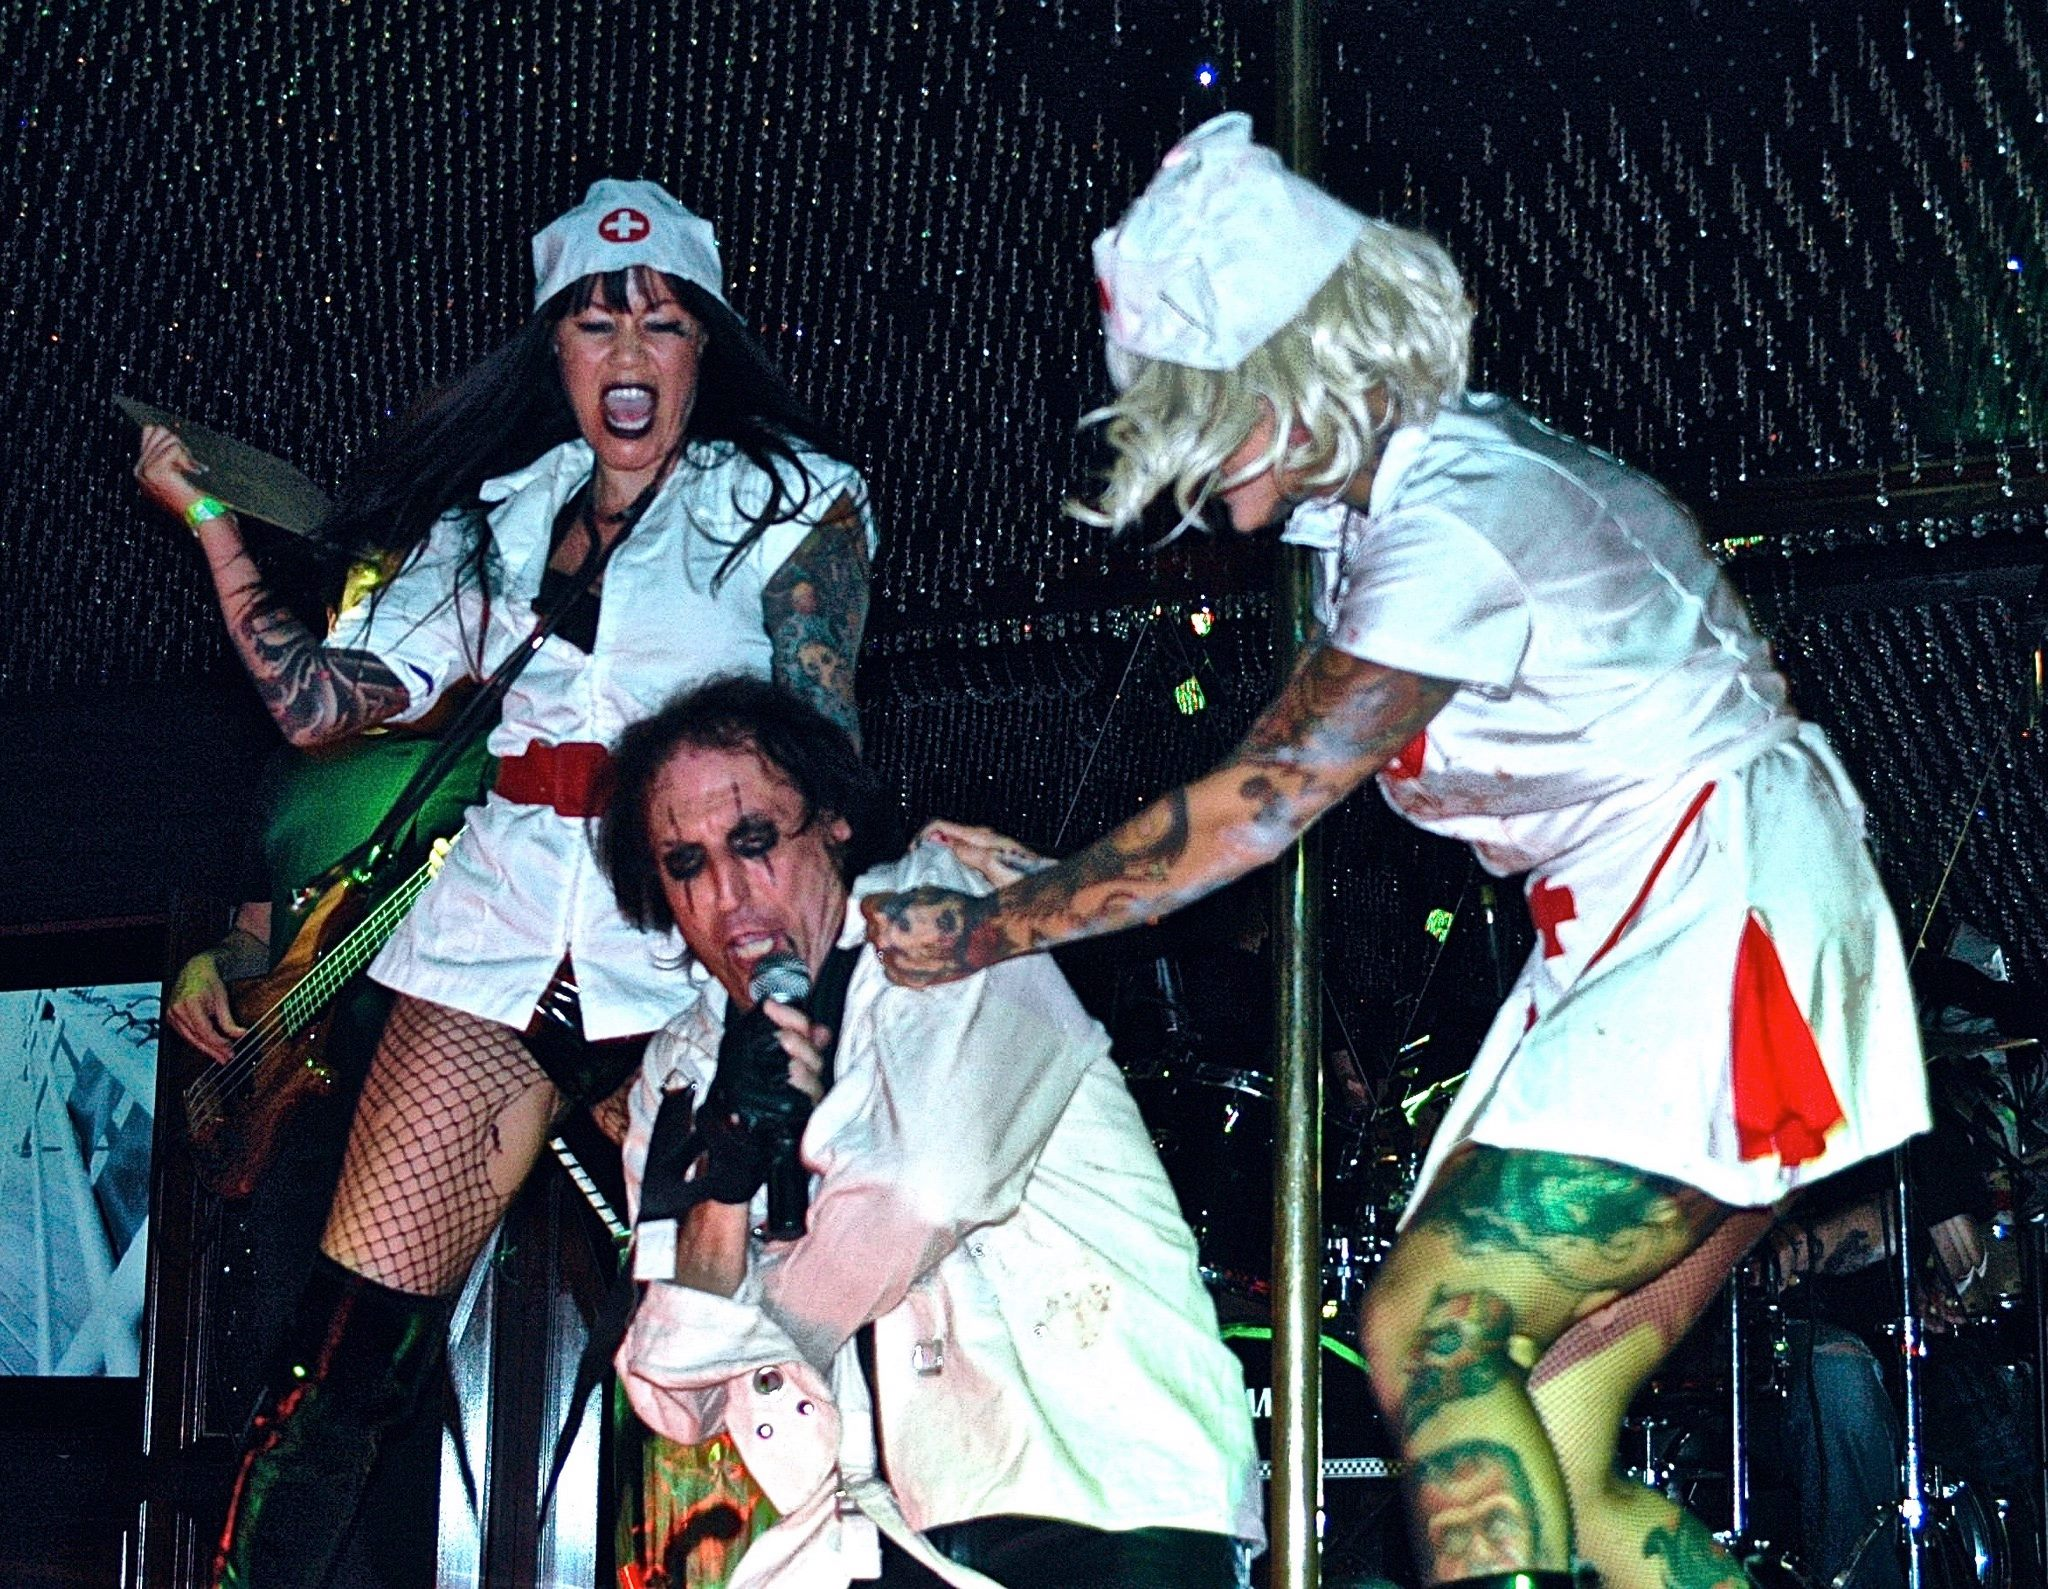 nightmare-nick-tribute-to-alice-cooper-metal-hayhem-mondays-at-crazy-girls